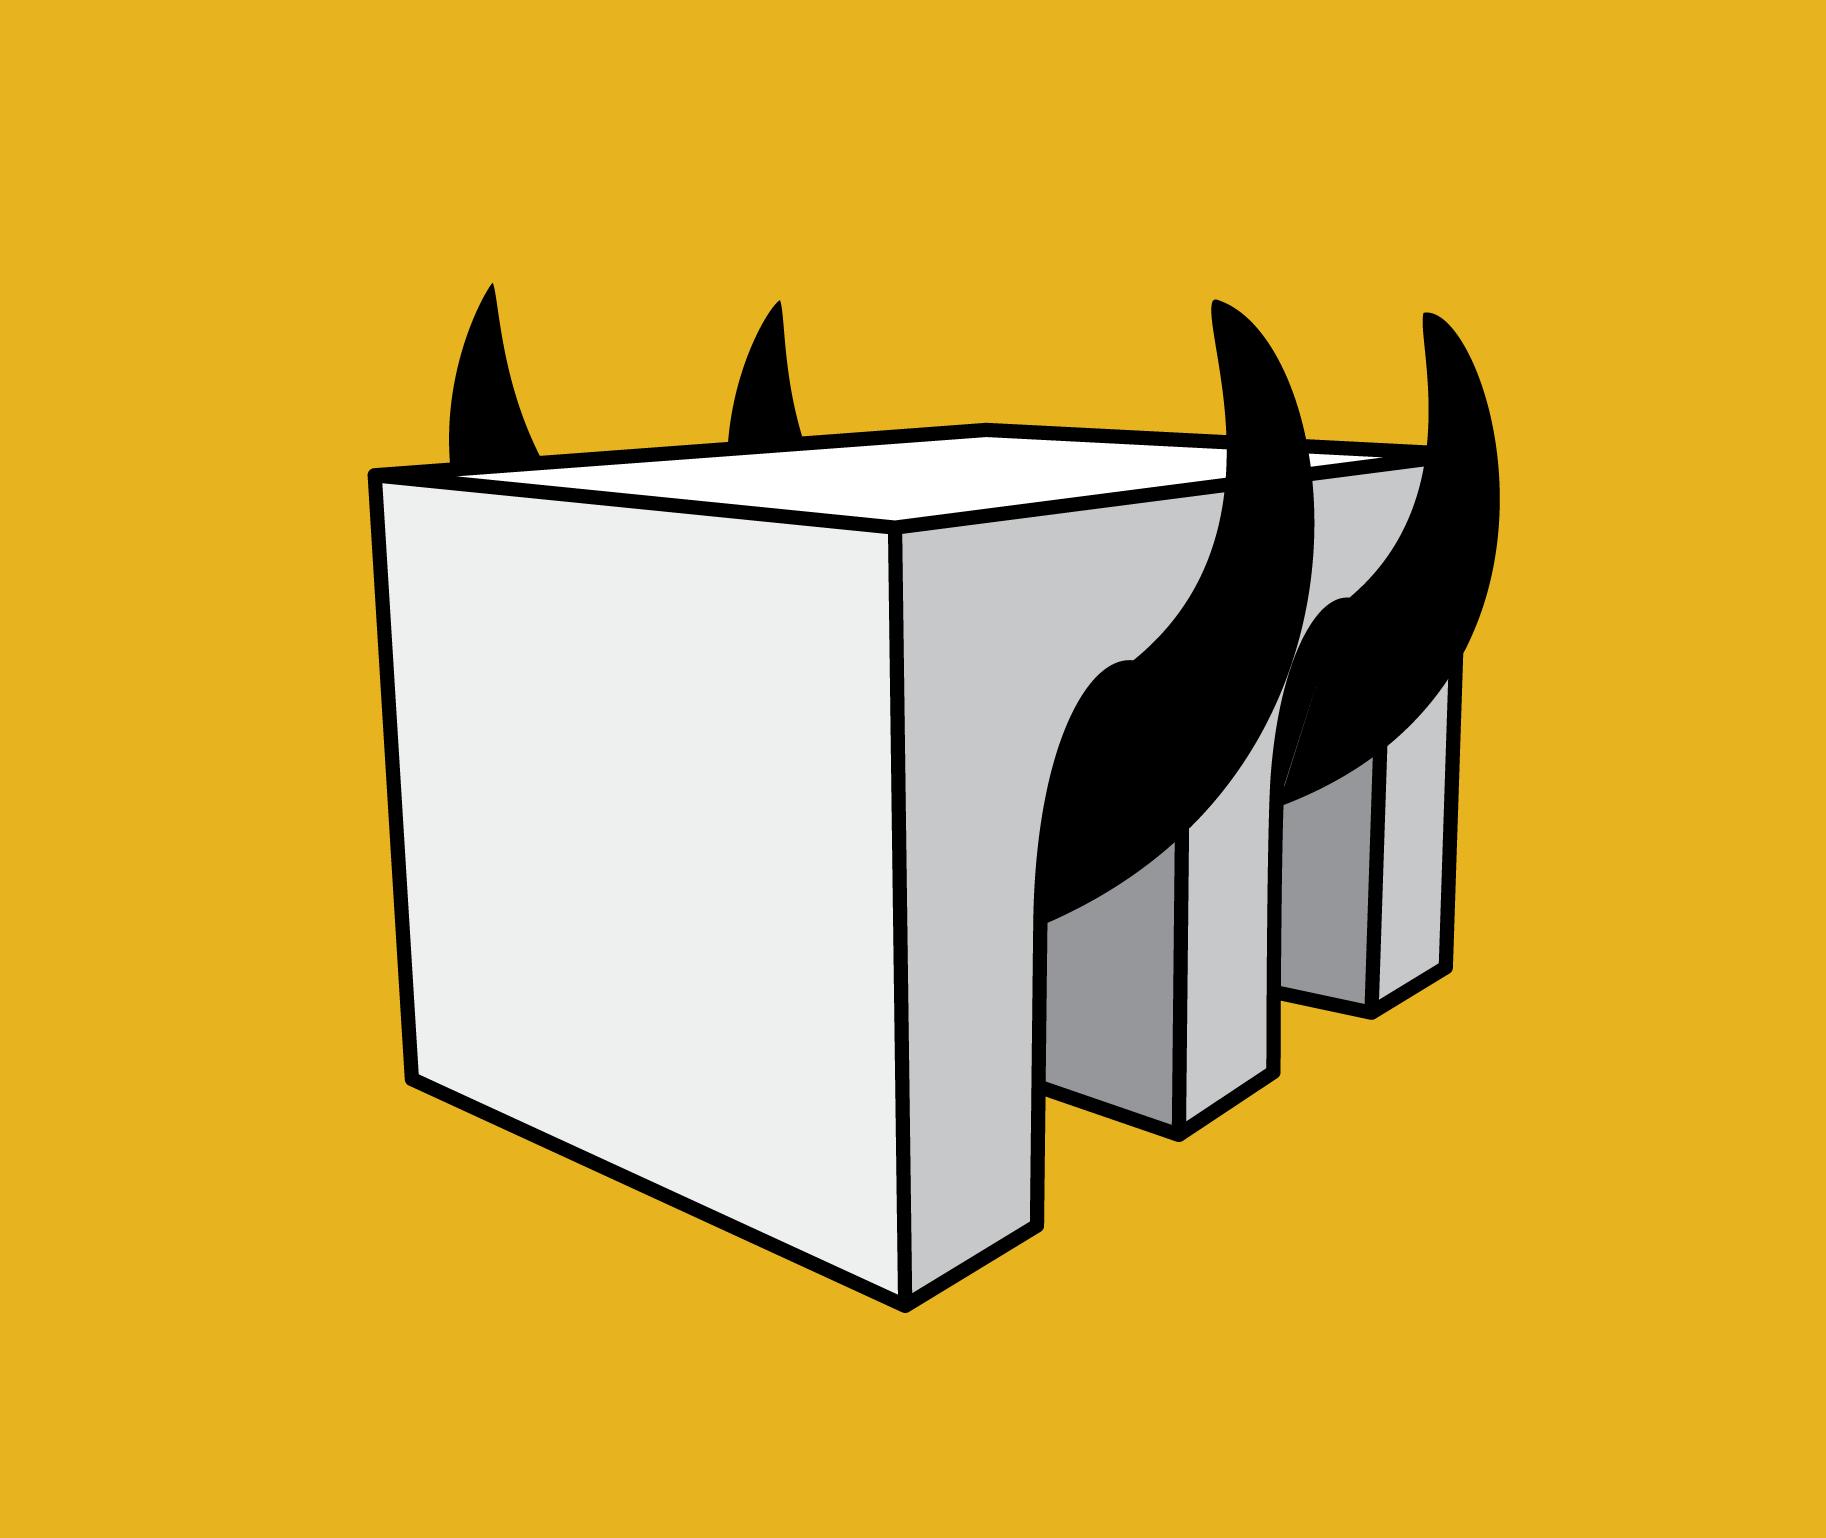 trademark, logo, icon, putamadre